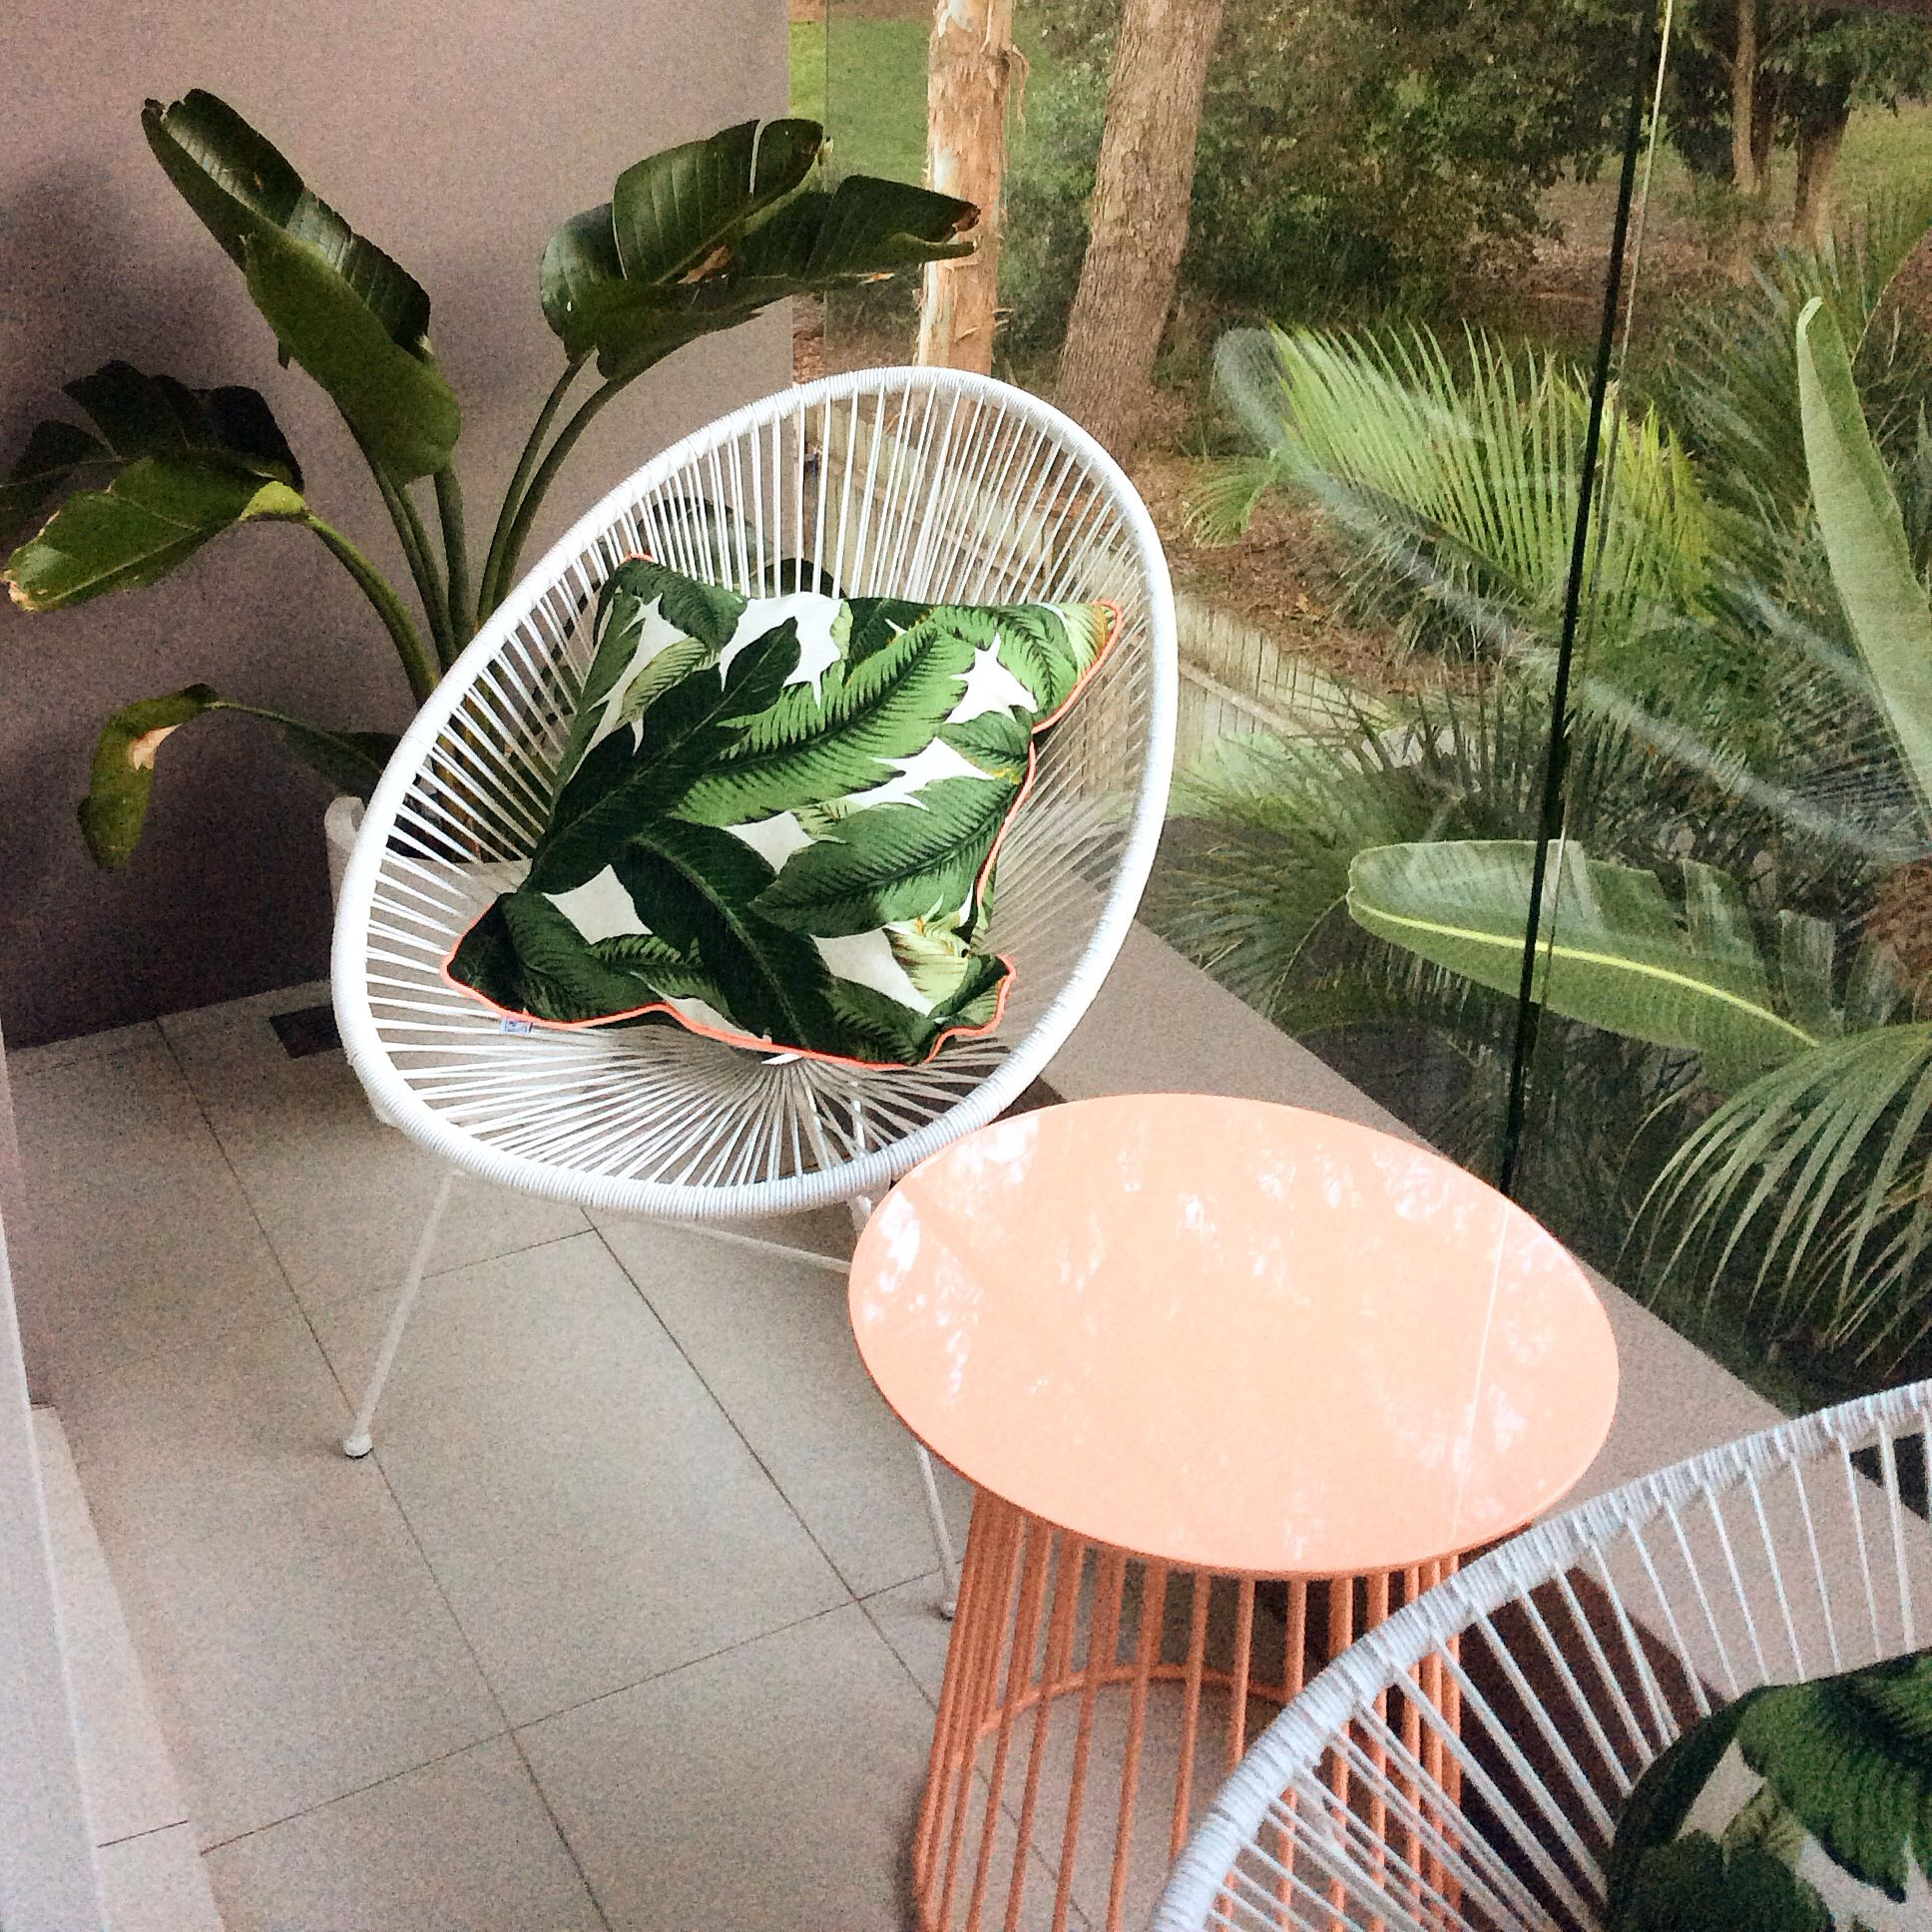 Outdoor Design For Small Balcony Urban Design Small Apartment